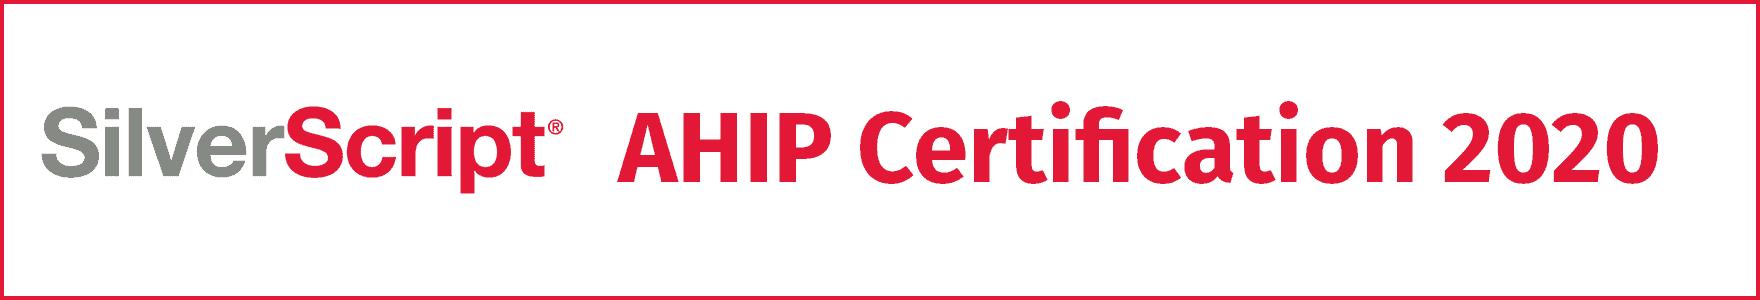 SilverScript AHIP Certification 2020